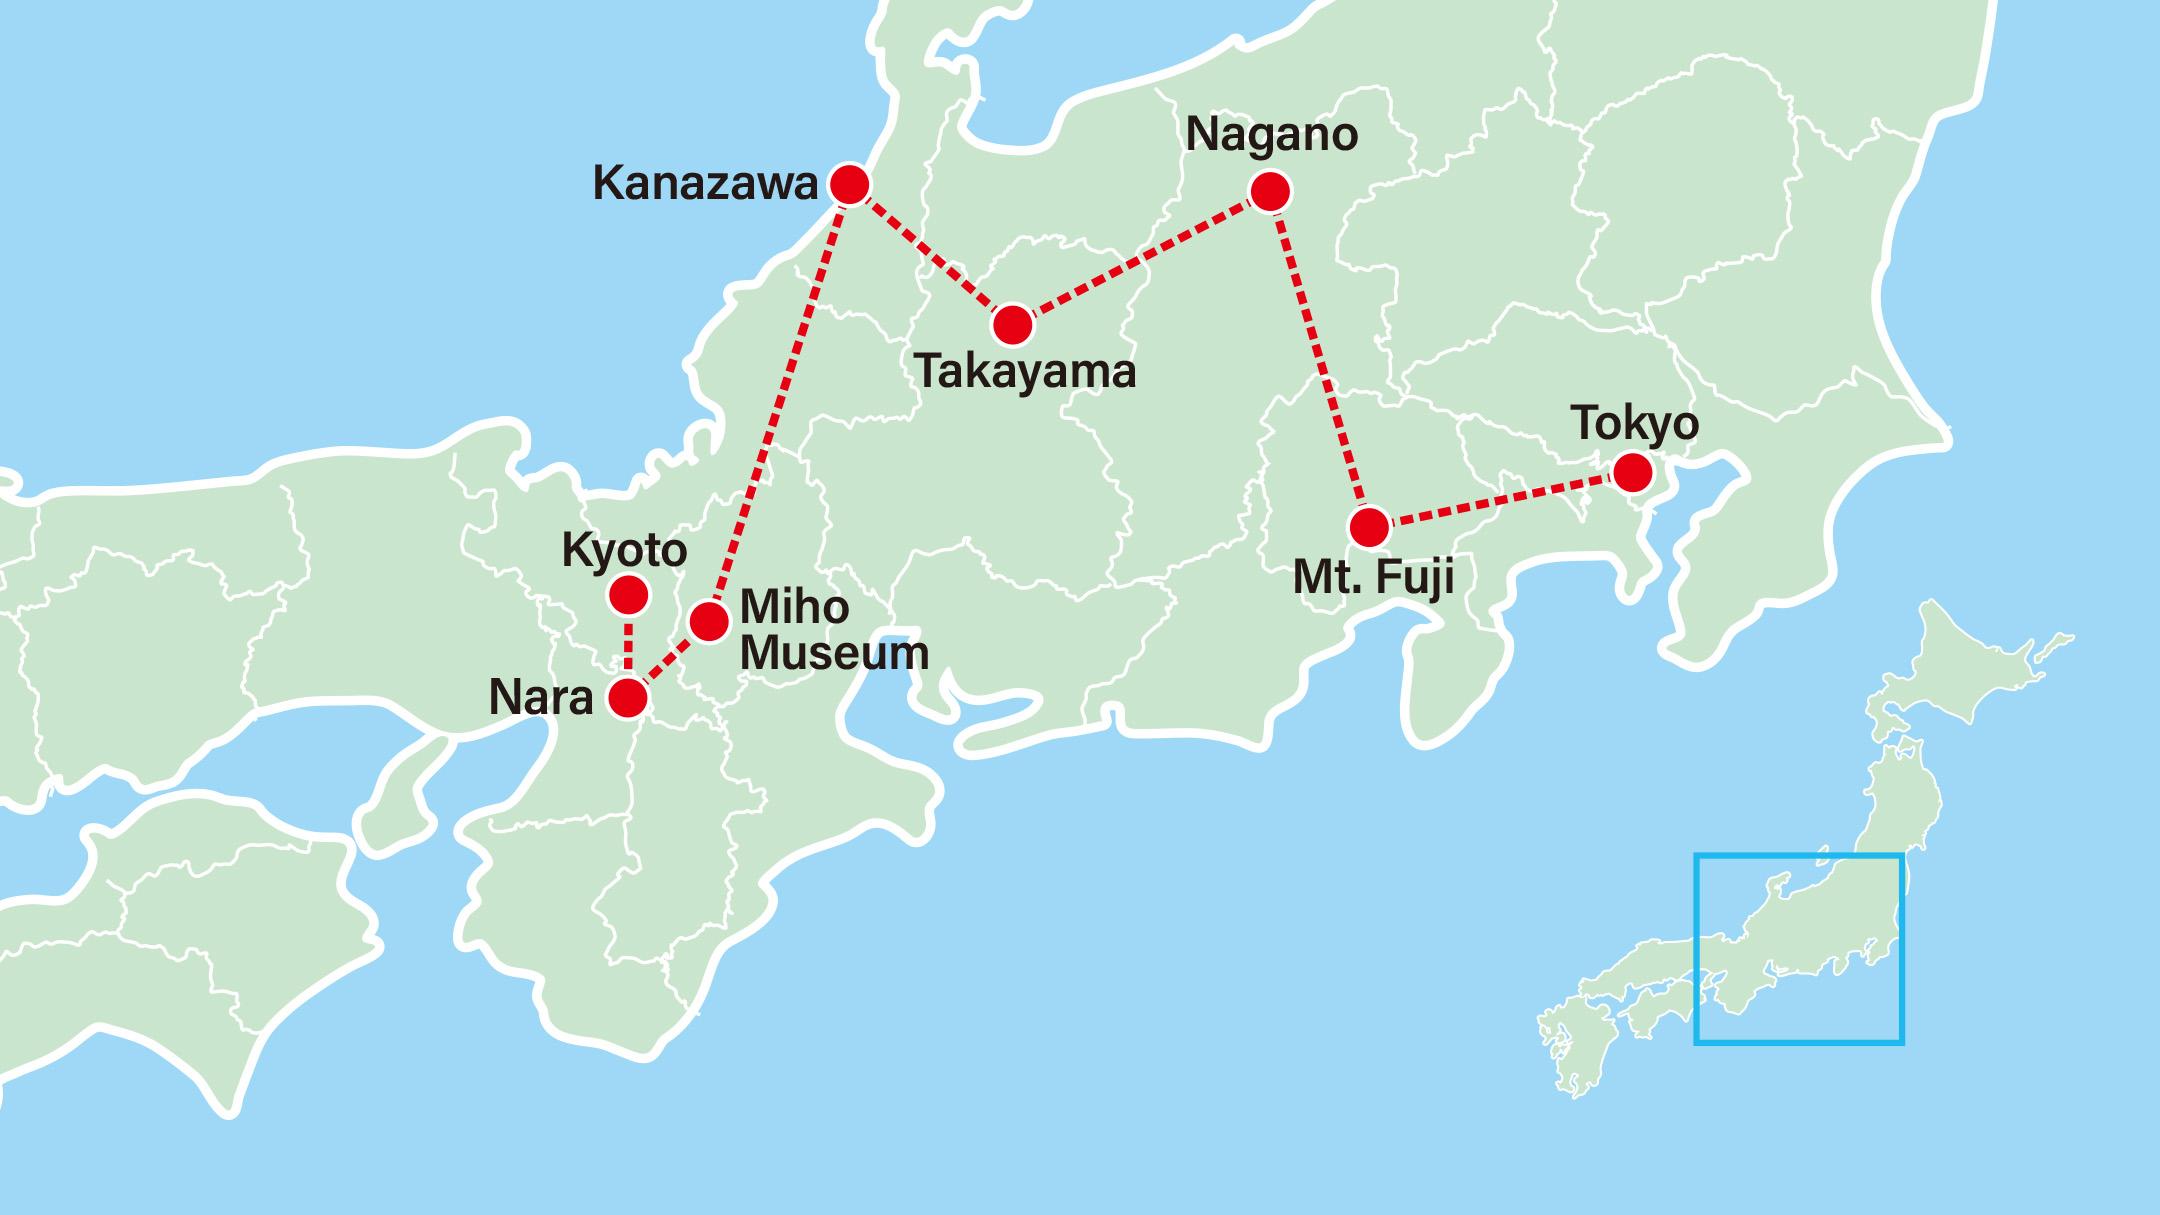 Takayama Spring Festival 8 Days-Tokyo-Lake Kawaguchi-Nagano-Takayama-Kanazawa-Miho Museum-Nara-Kyoto